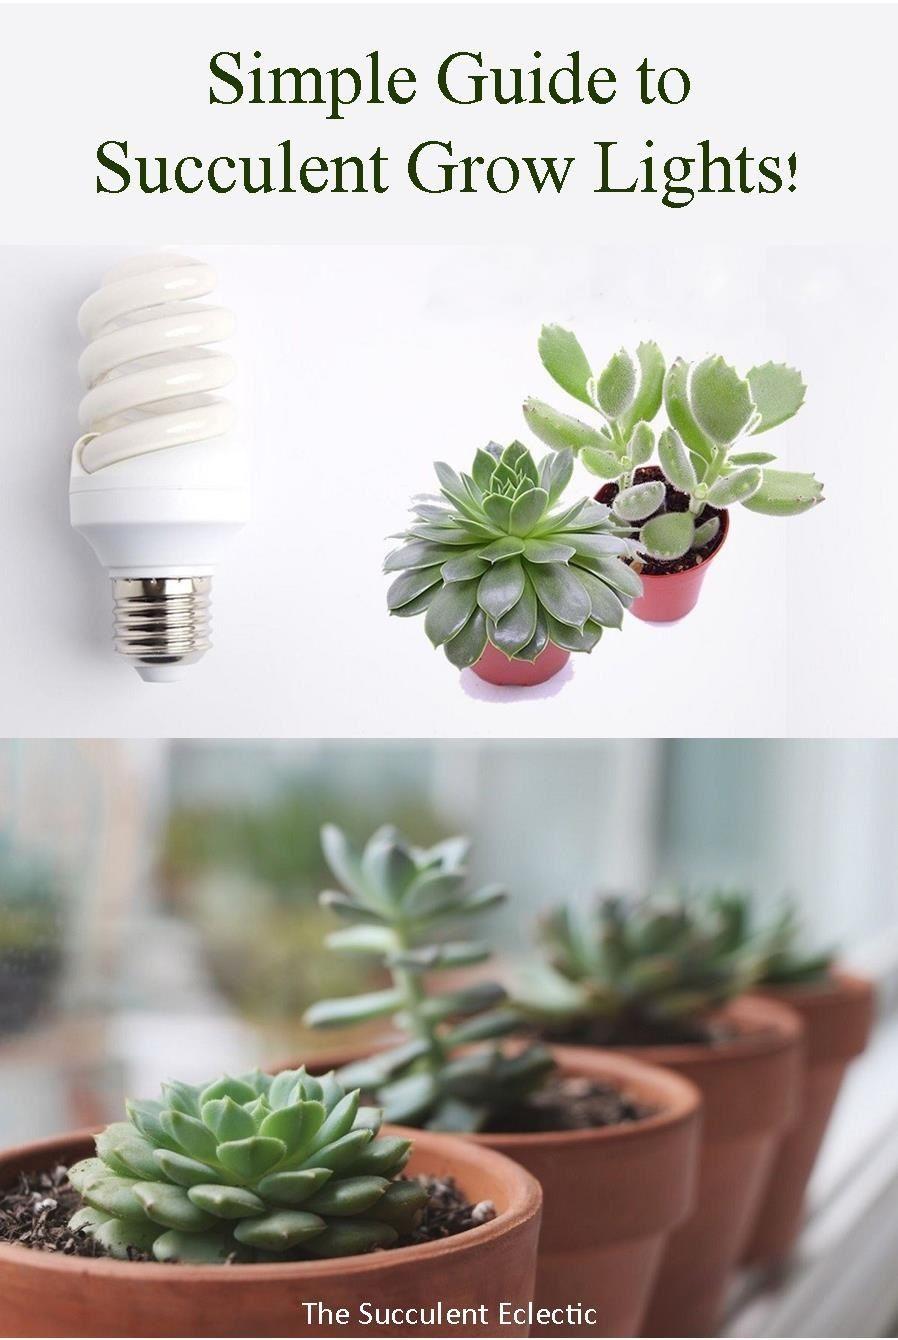 Grow Lights For Succulents In 2020 Grow Lights Succulents Succulent Planter Diy